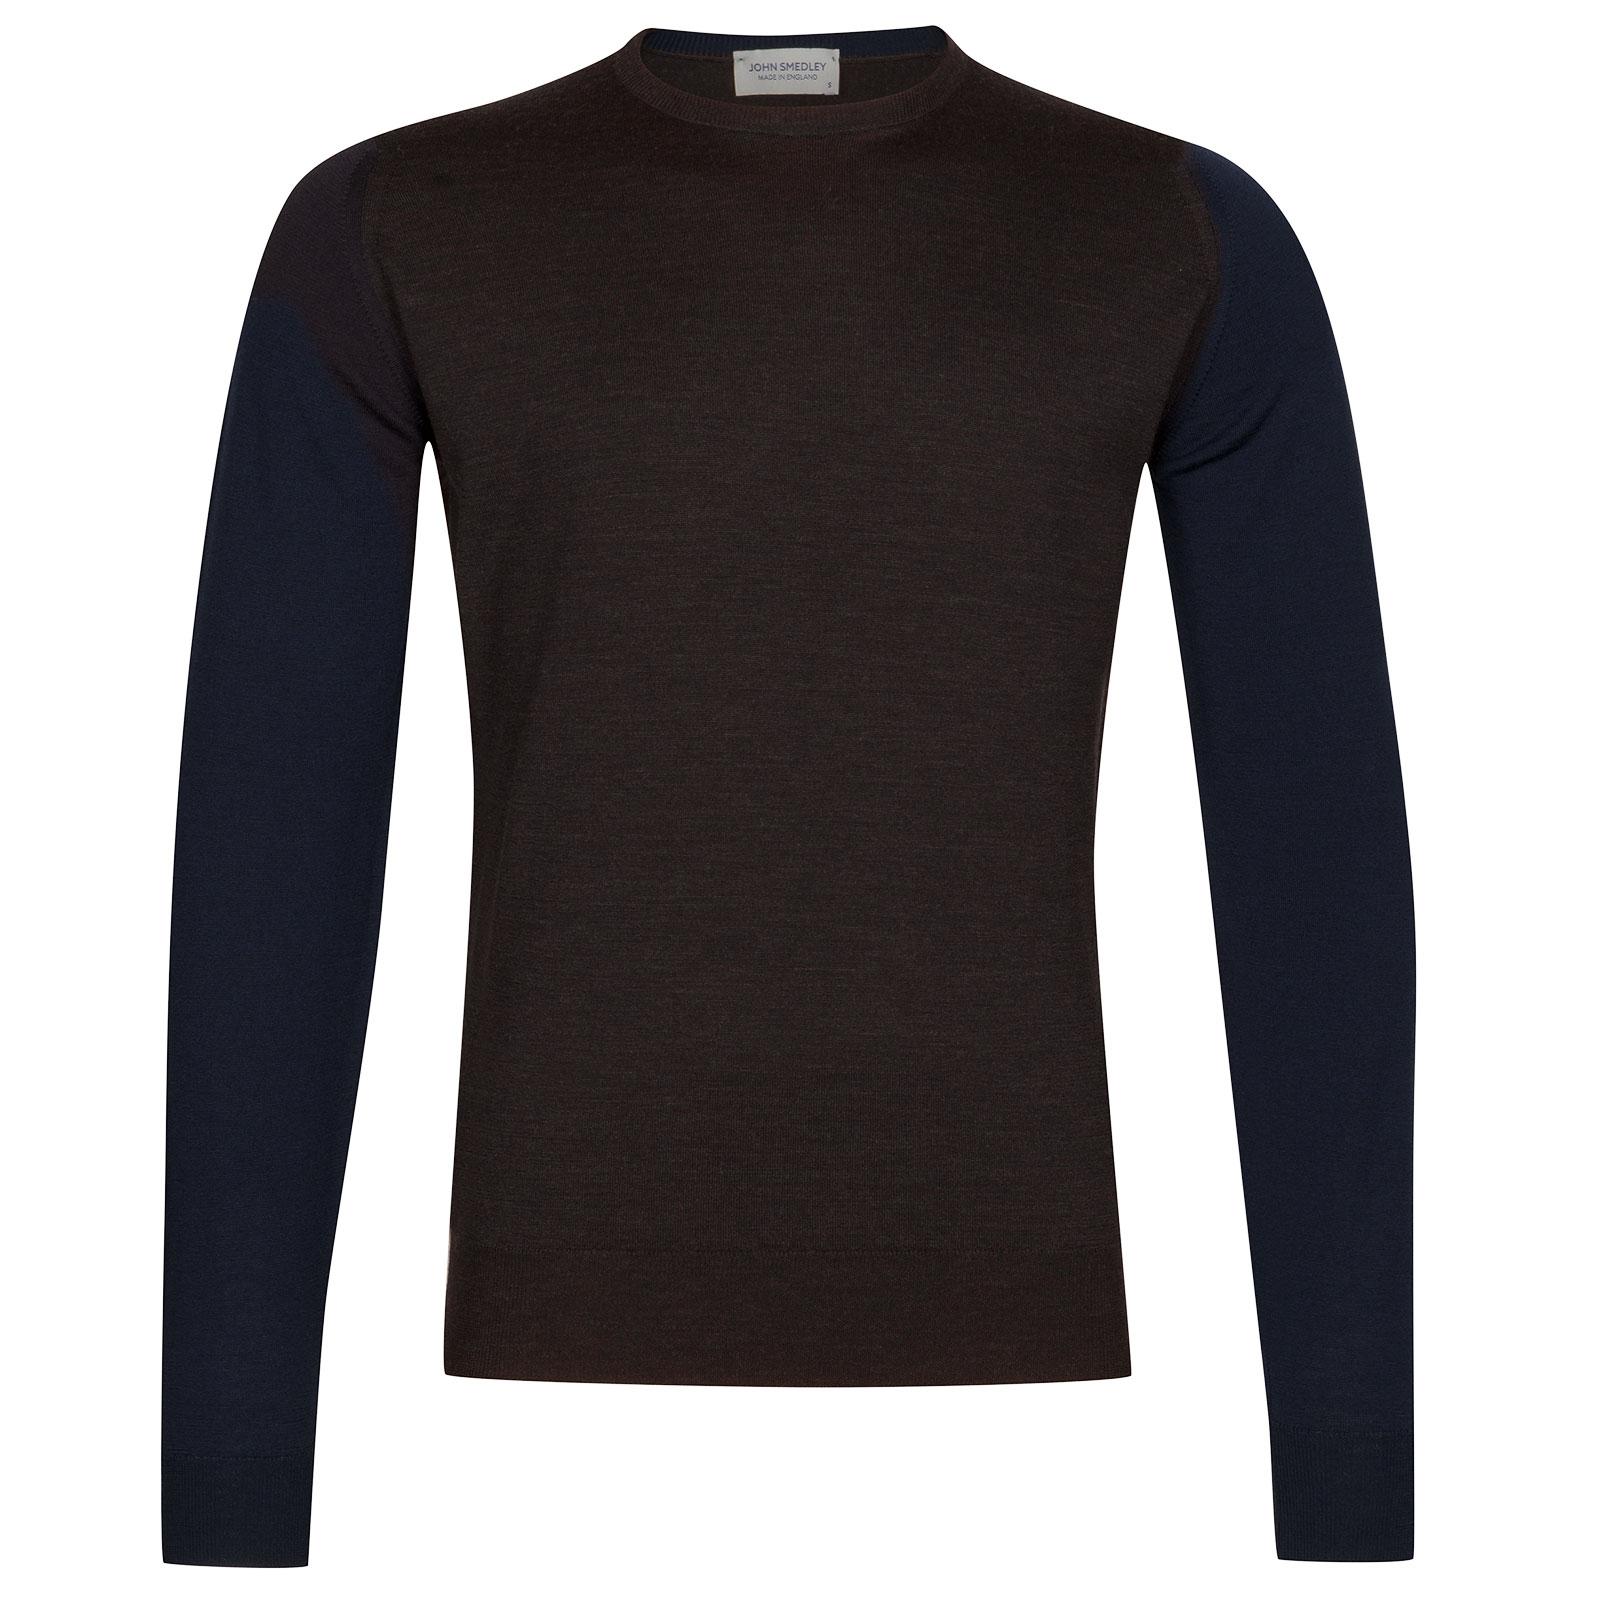 John Smedley Hindlow Extra Fine Merino Wool Pullover in Hepburn